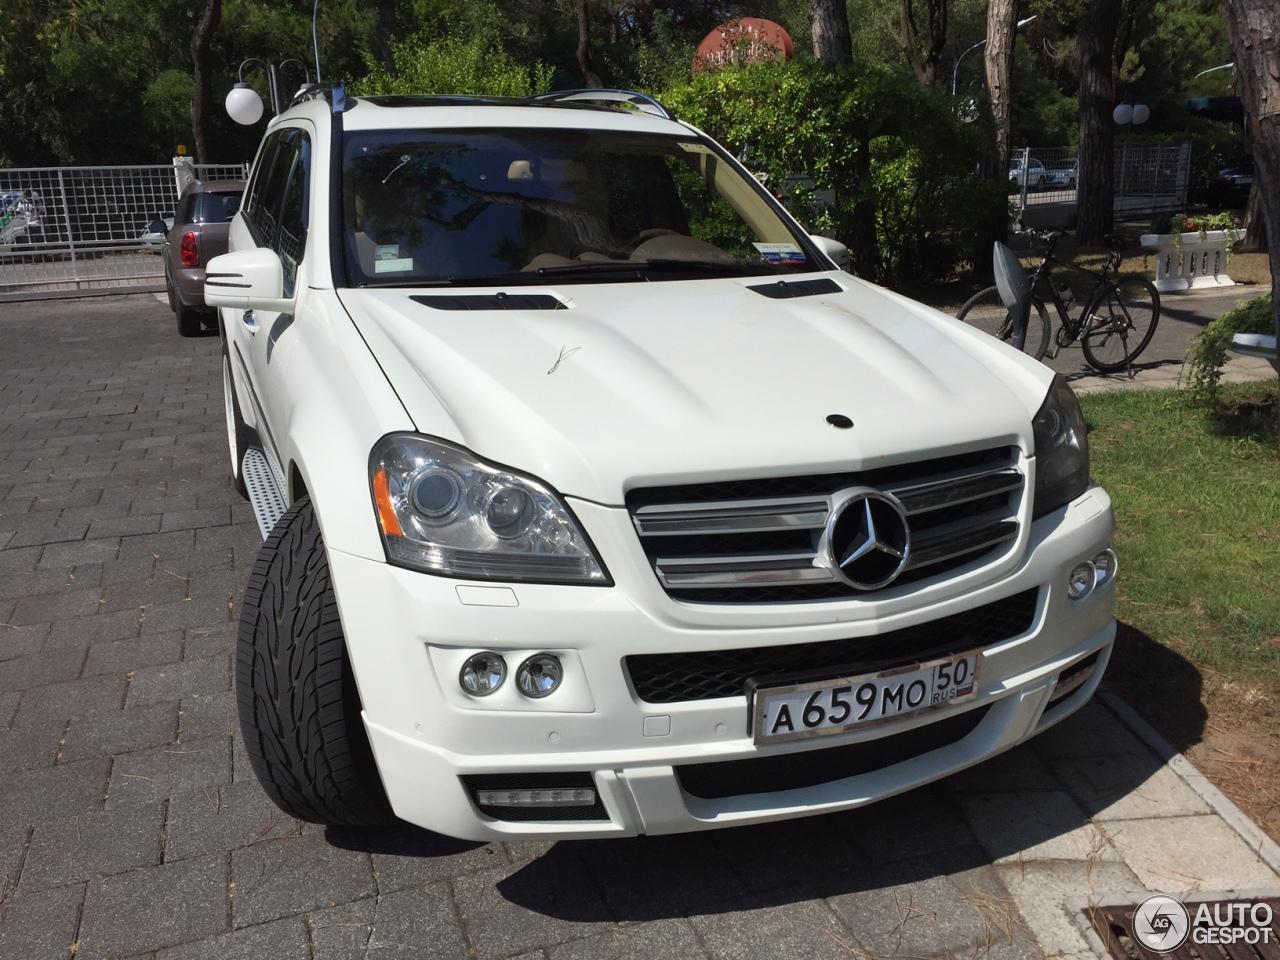 Mercedes benz brabus gl 63 biturbo 30 july 2016 autogespot for Mercedes benz brabus price